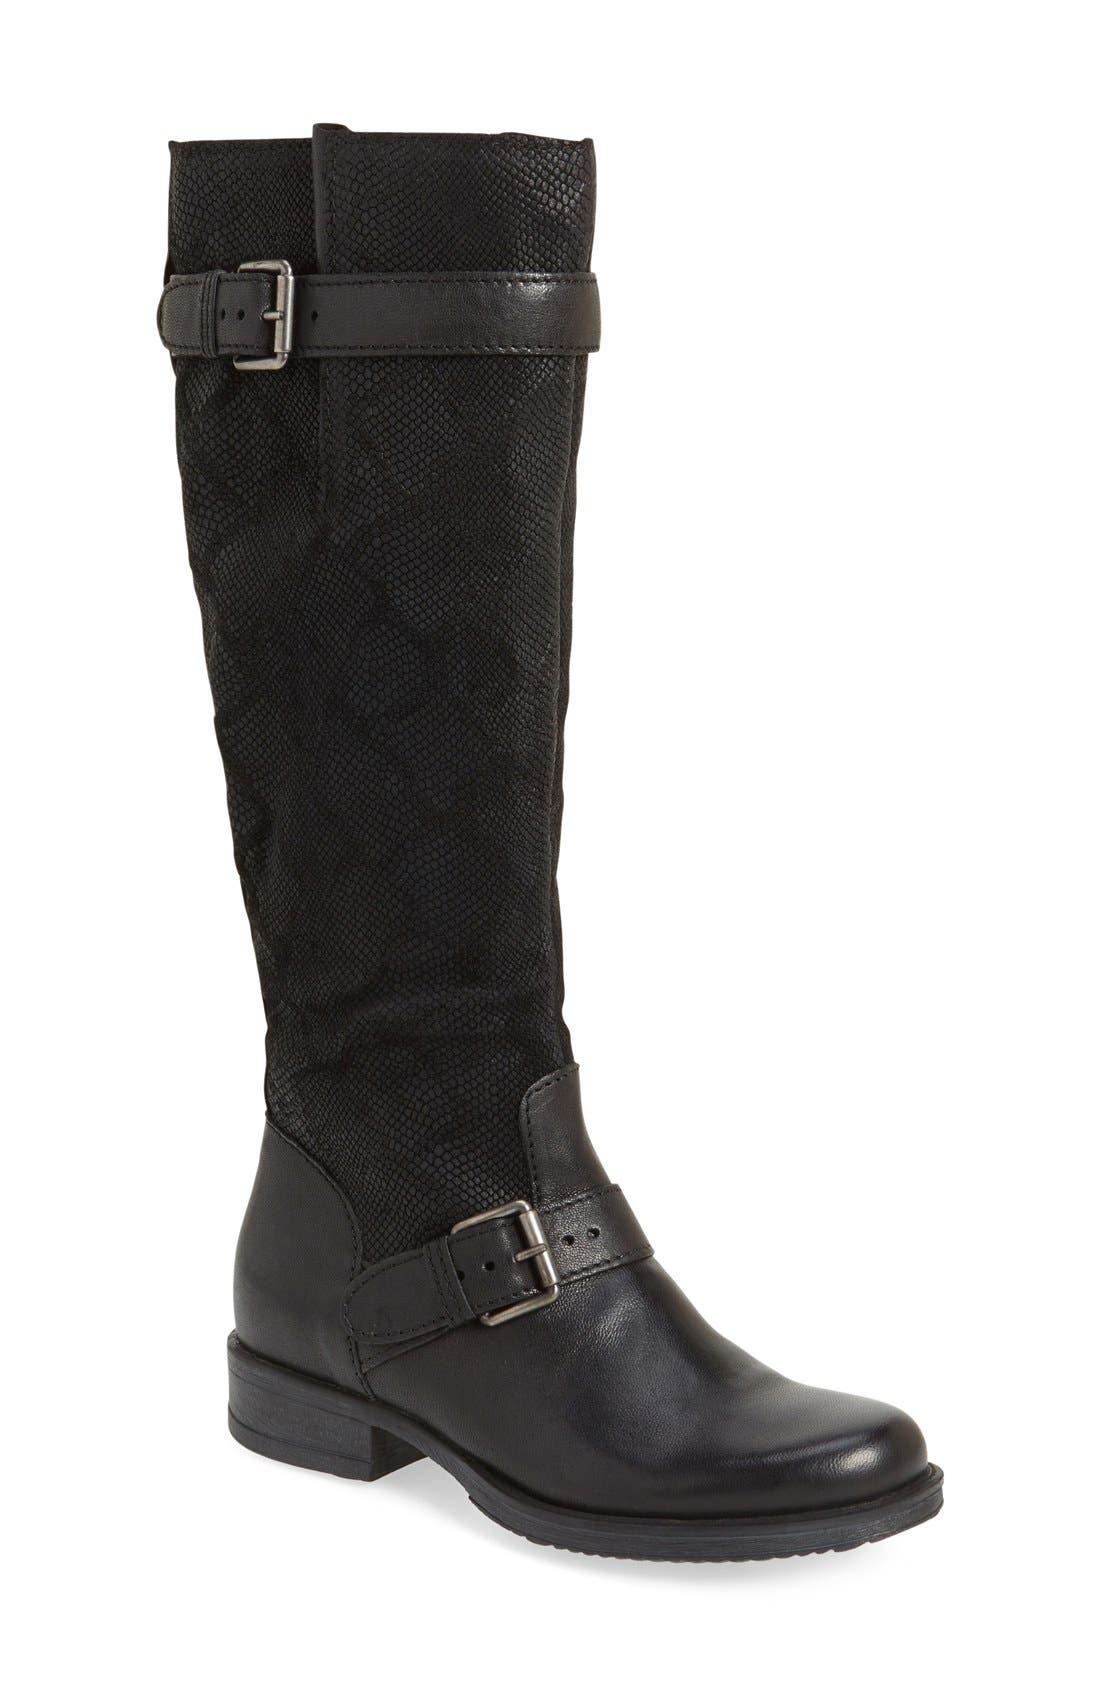 Alternate Image 1 Selected - MizMooz'Archer' Tall Boot (Women)